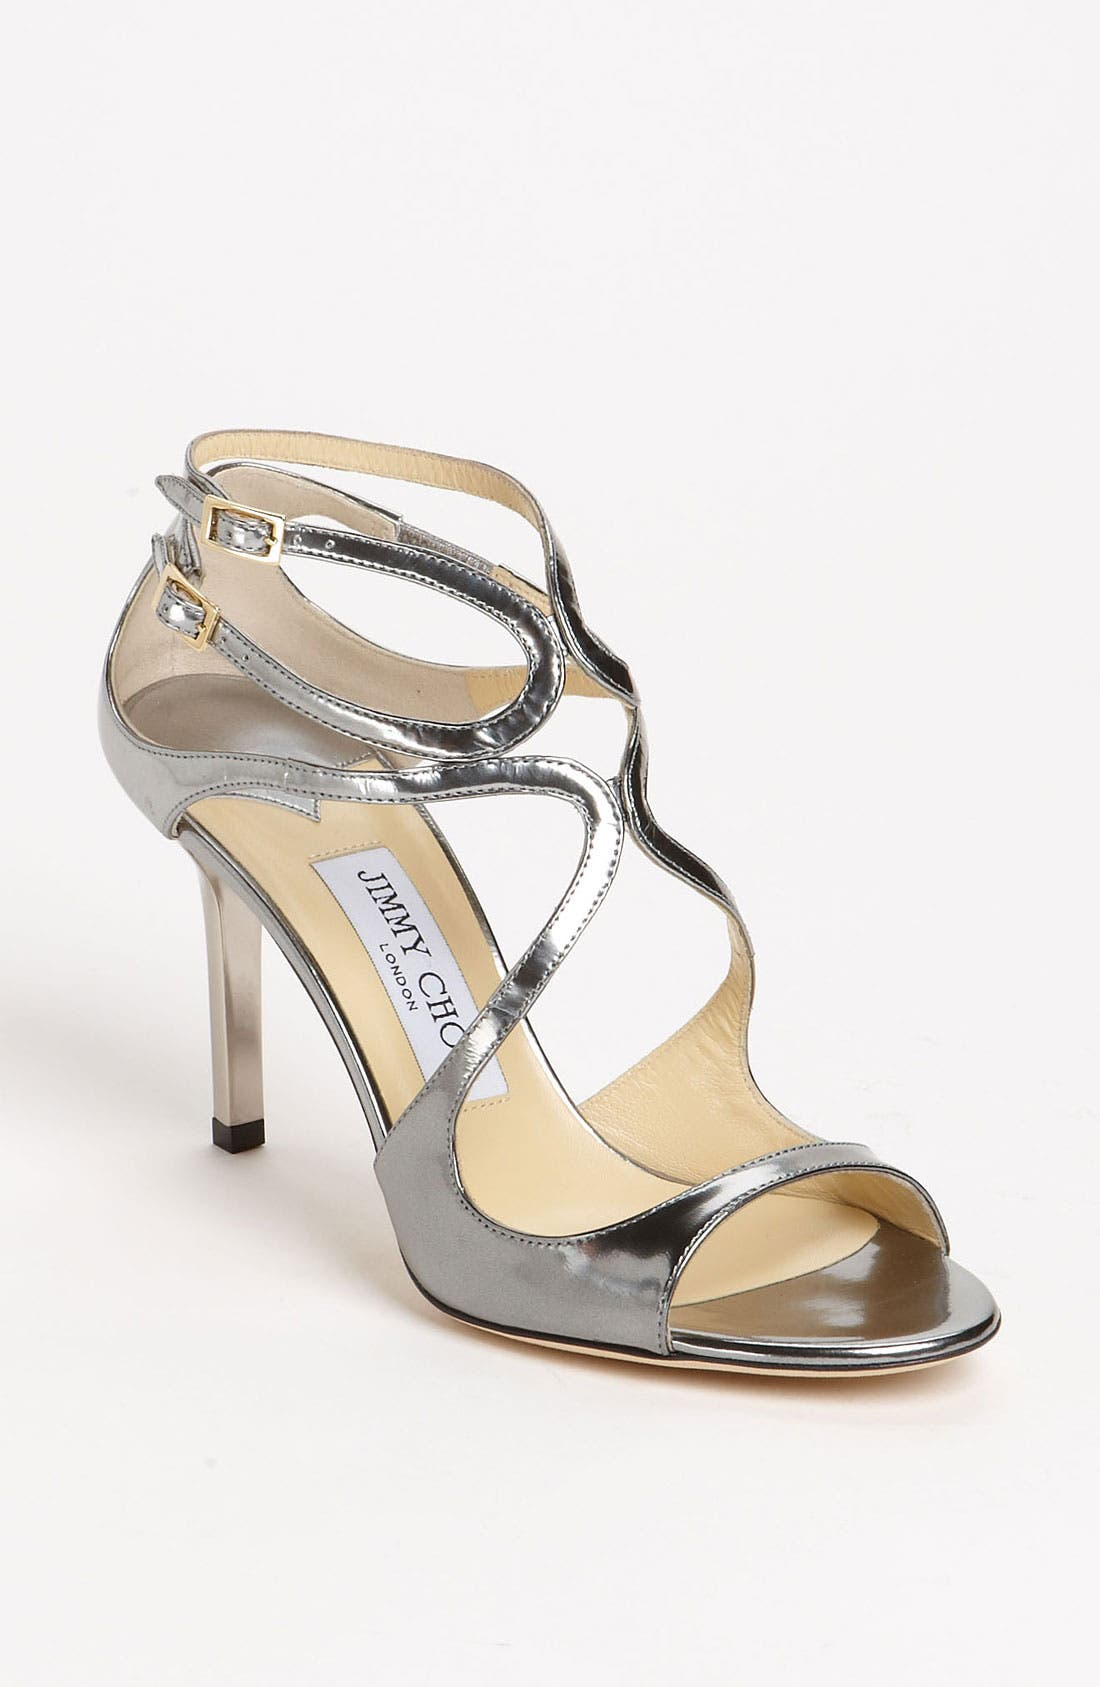 Main Image - Jimmy Choo 'Ivette' Strap Sandal